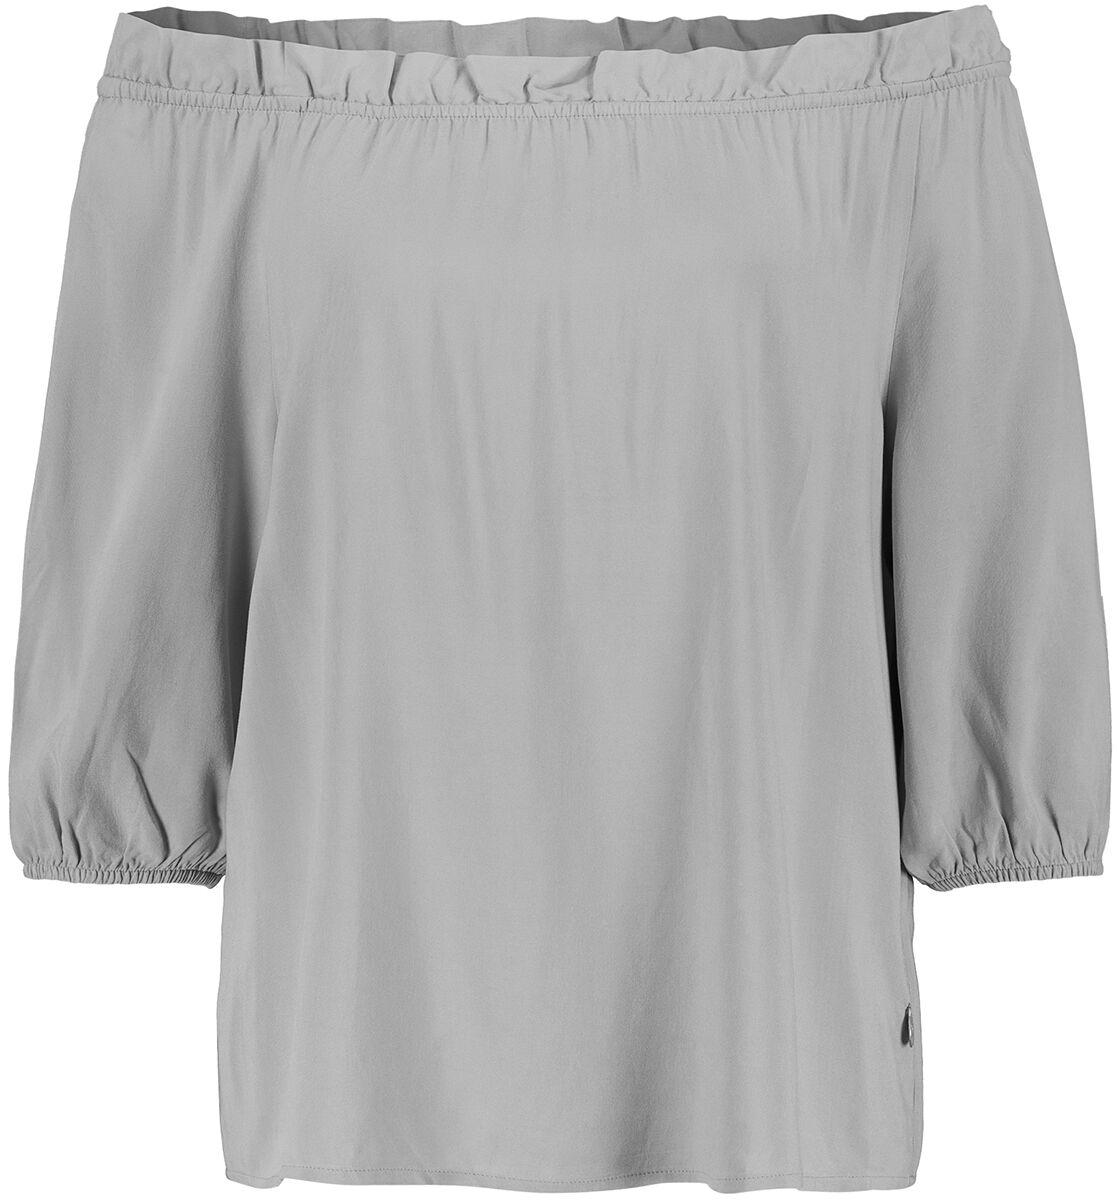 Image of Eight2Nine Slip In Blouse Bluse grau